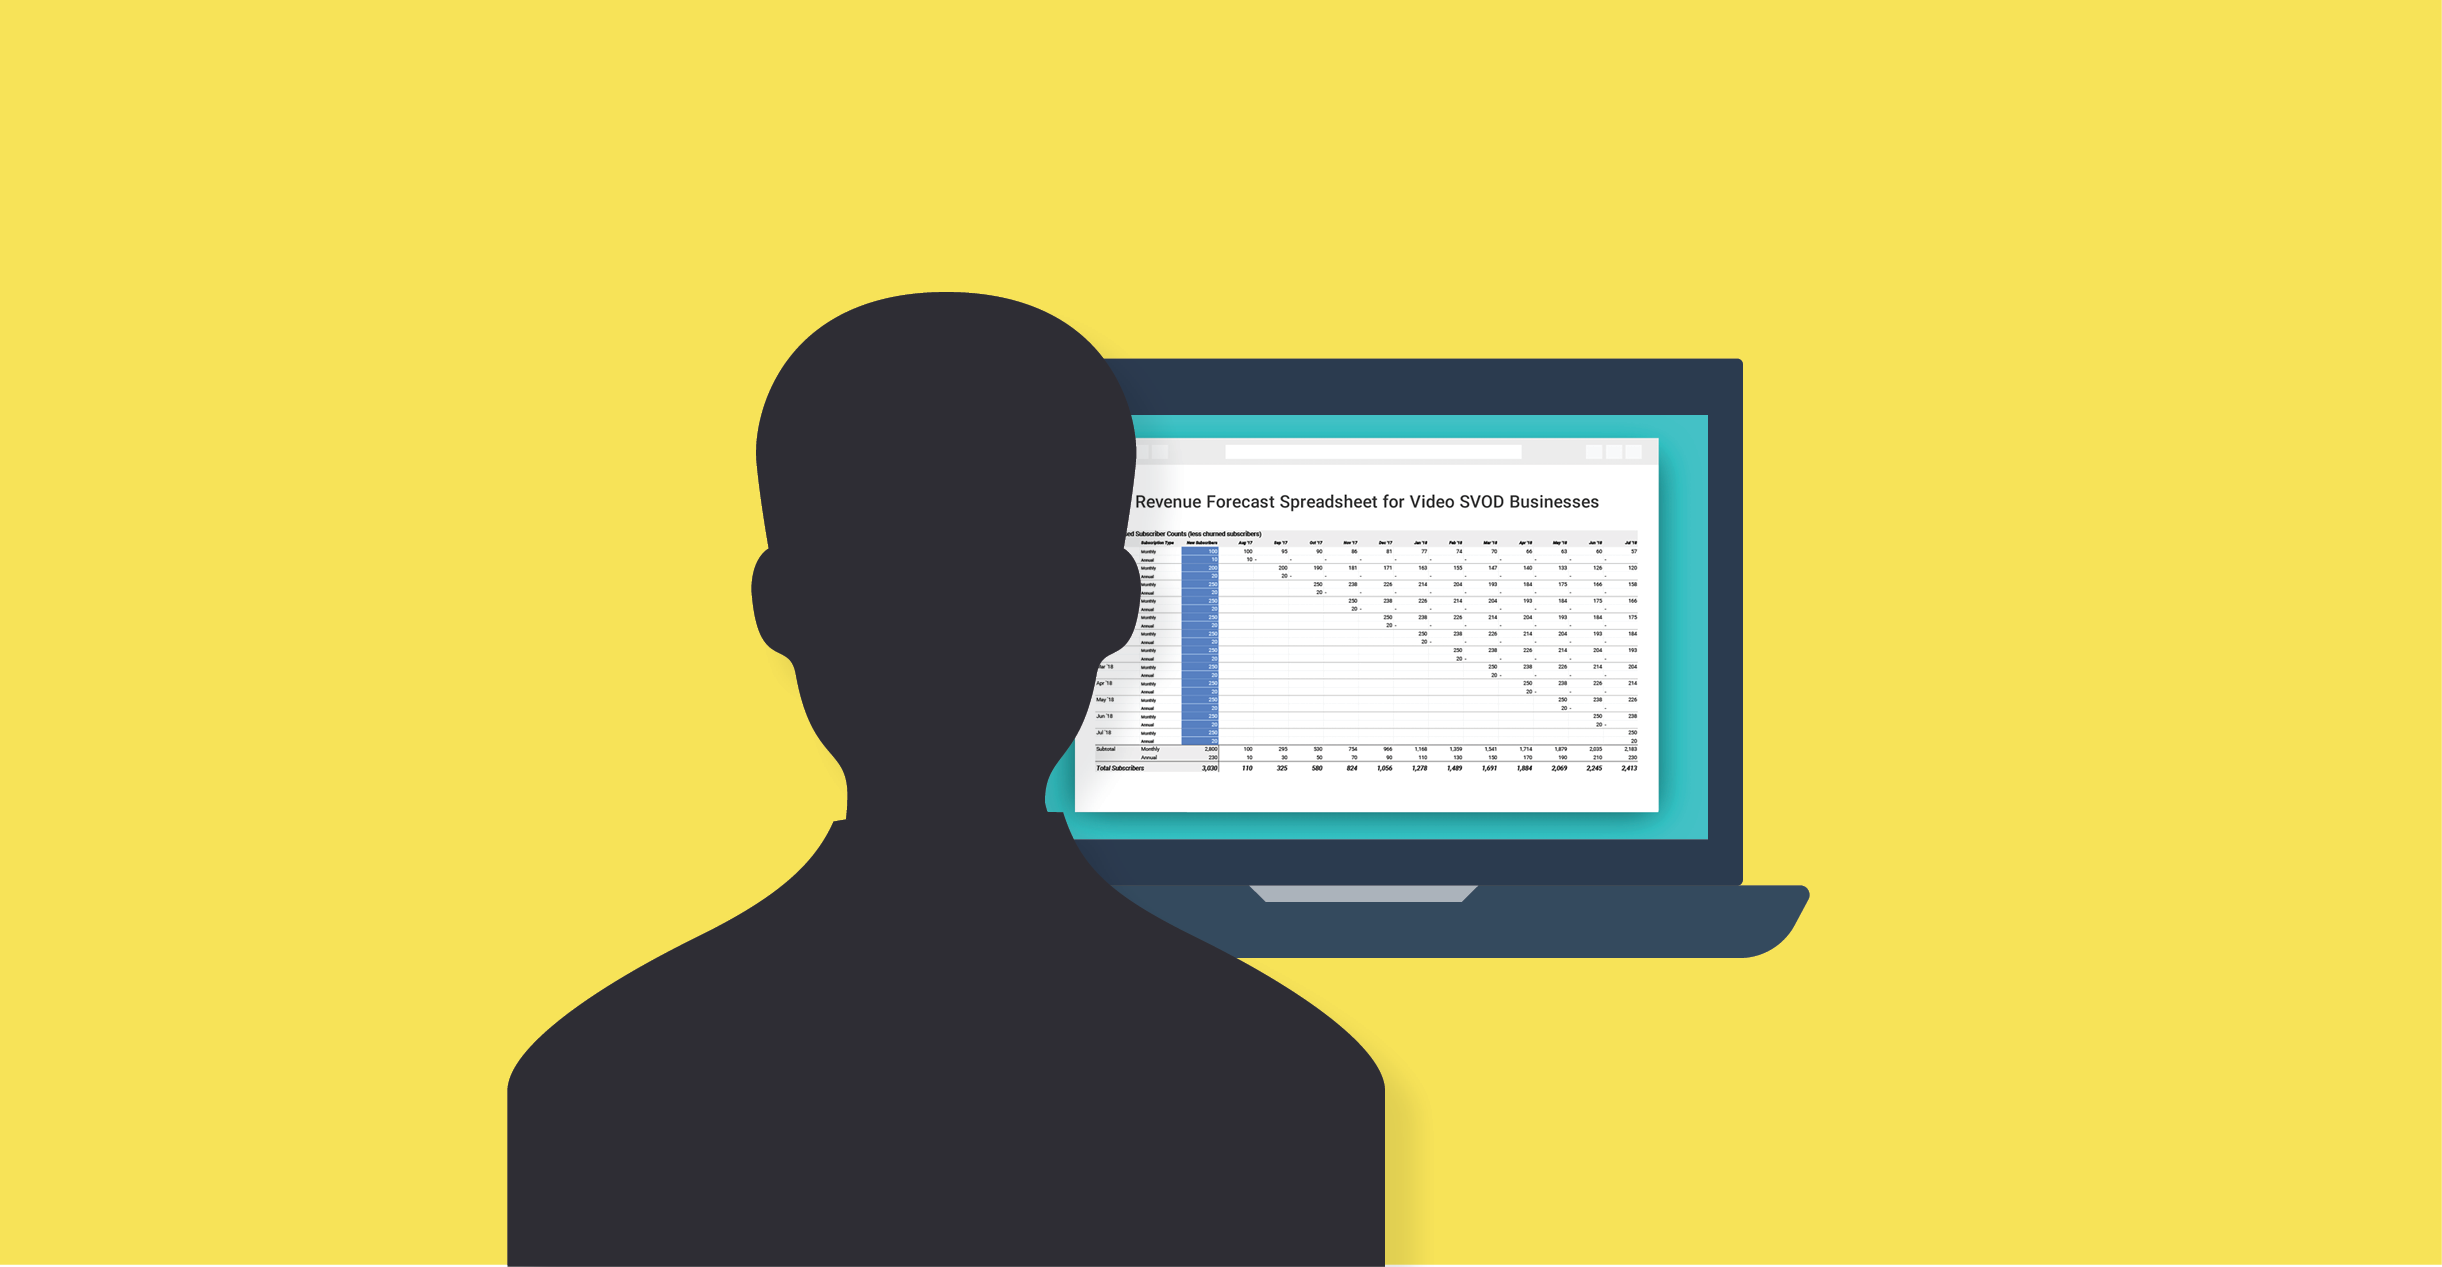 Revenue Forecast Spreadsheet for Video Subscription Businesses